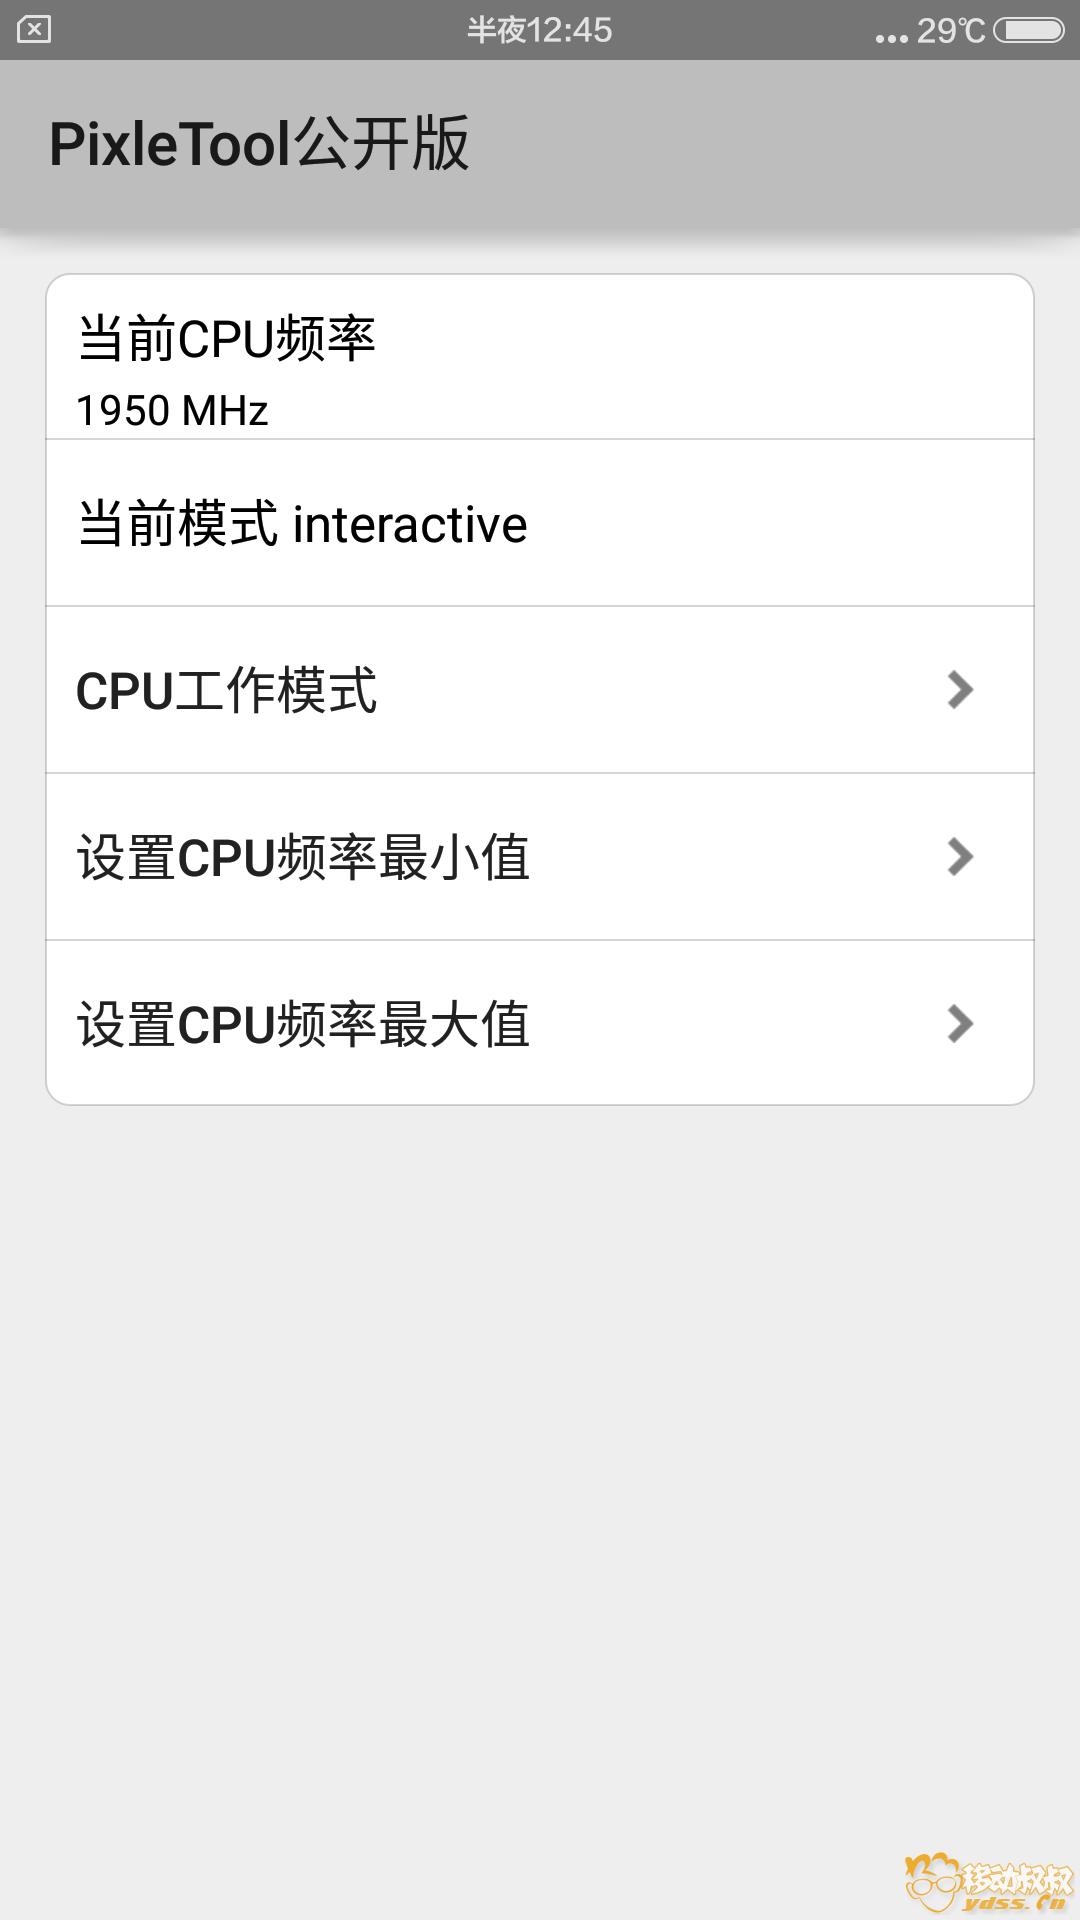 Screenshot_com.example.advsettings_2015-01-01-00-45-45.png